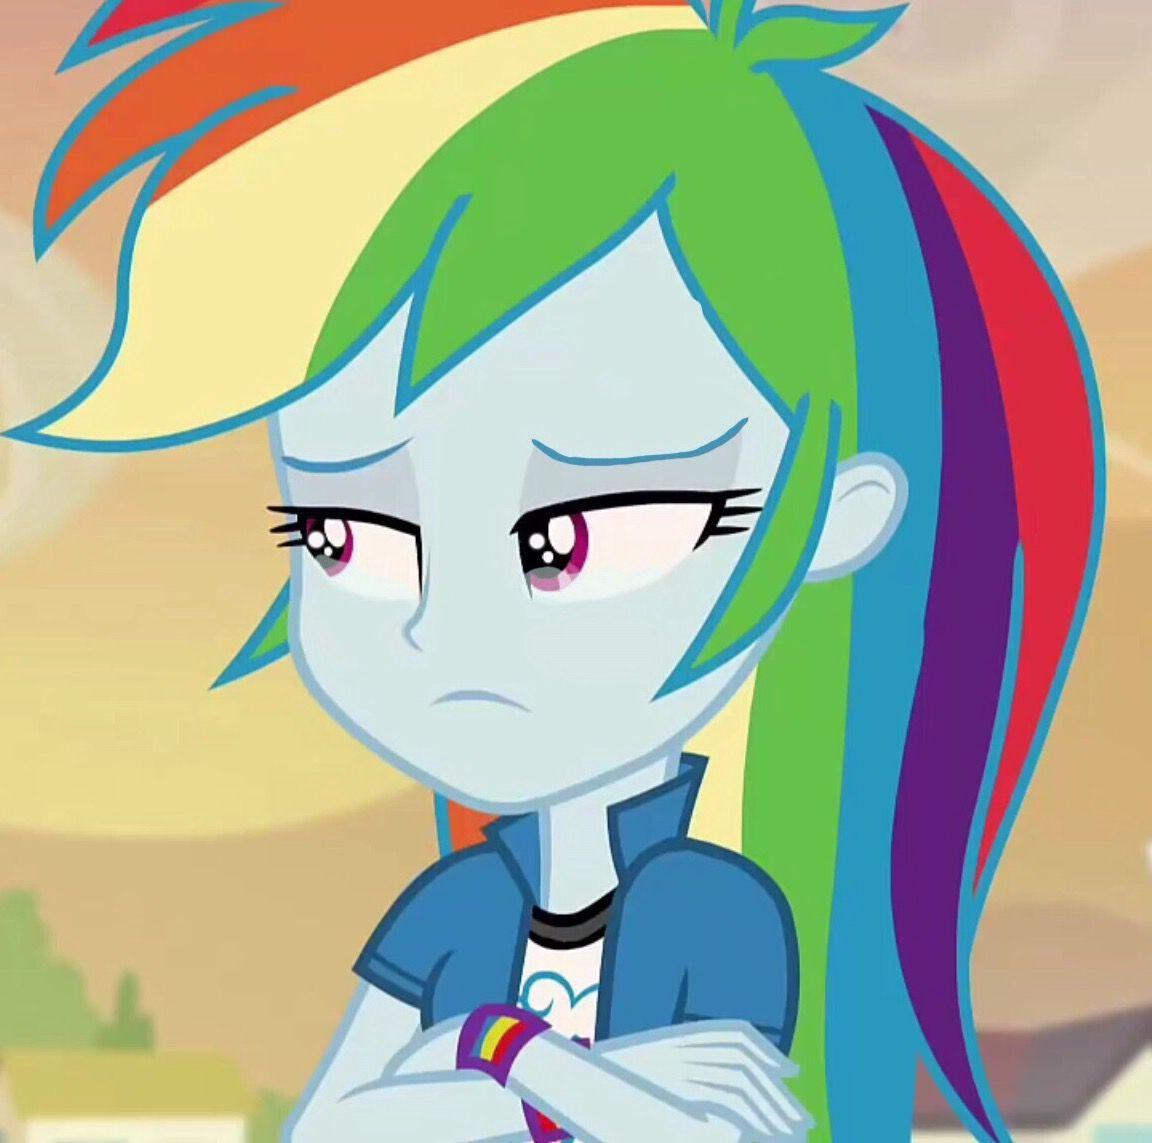 Equestria Girls Soraindash Learning To Love Equestria Girls Rainbow Dash My Little Pony Comic My Little Pony Characters